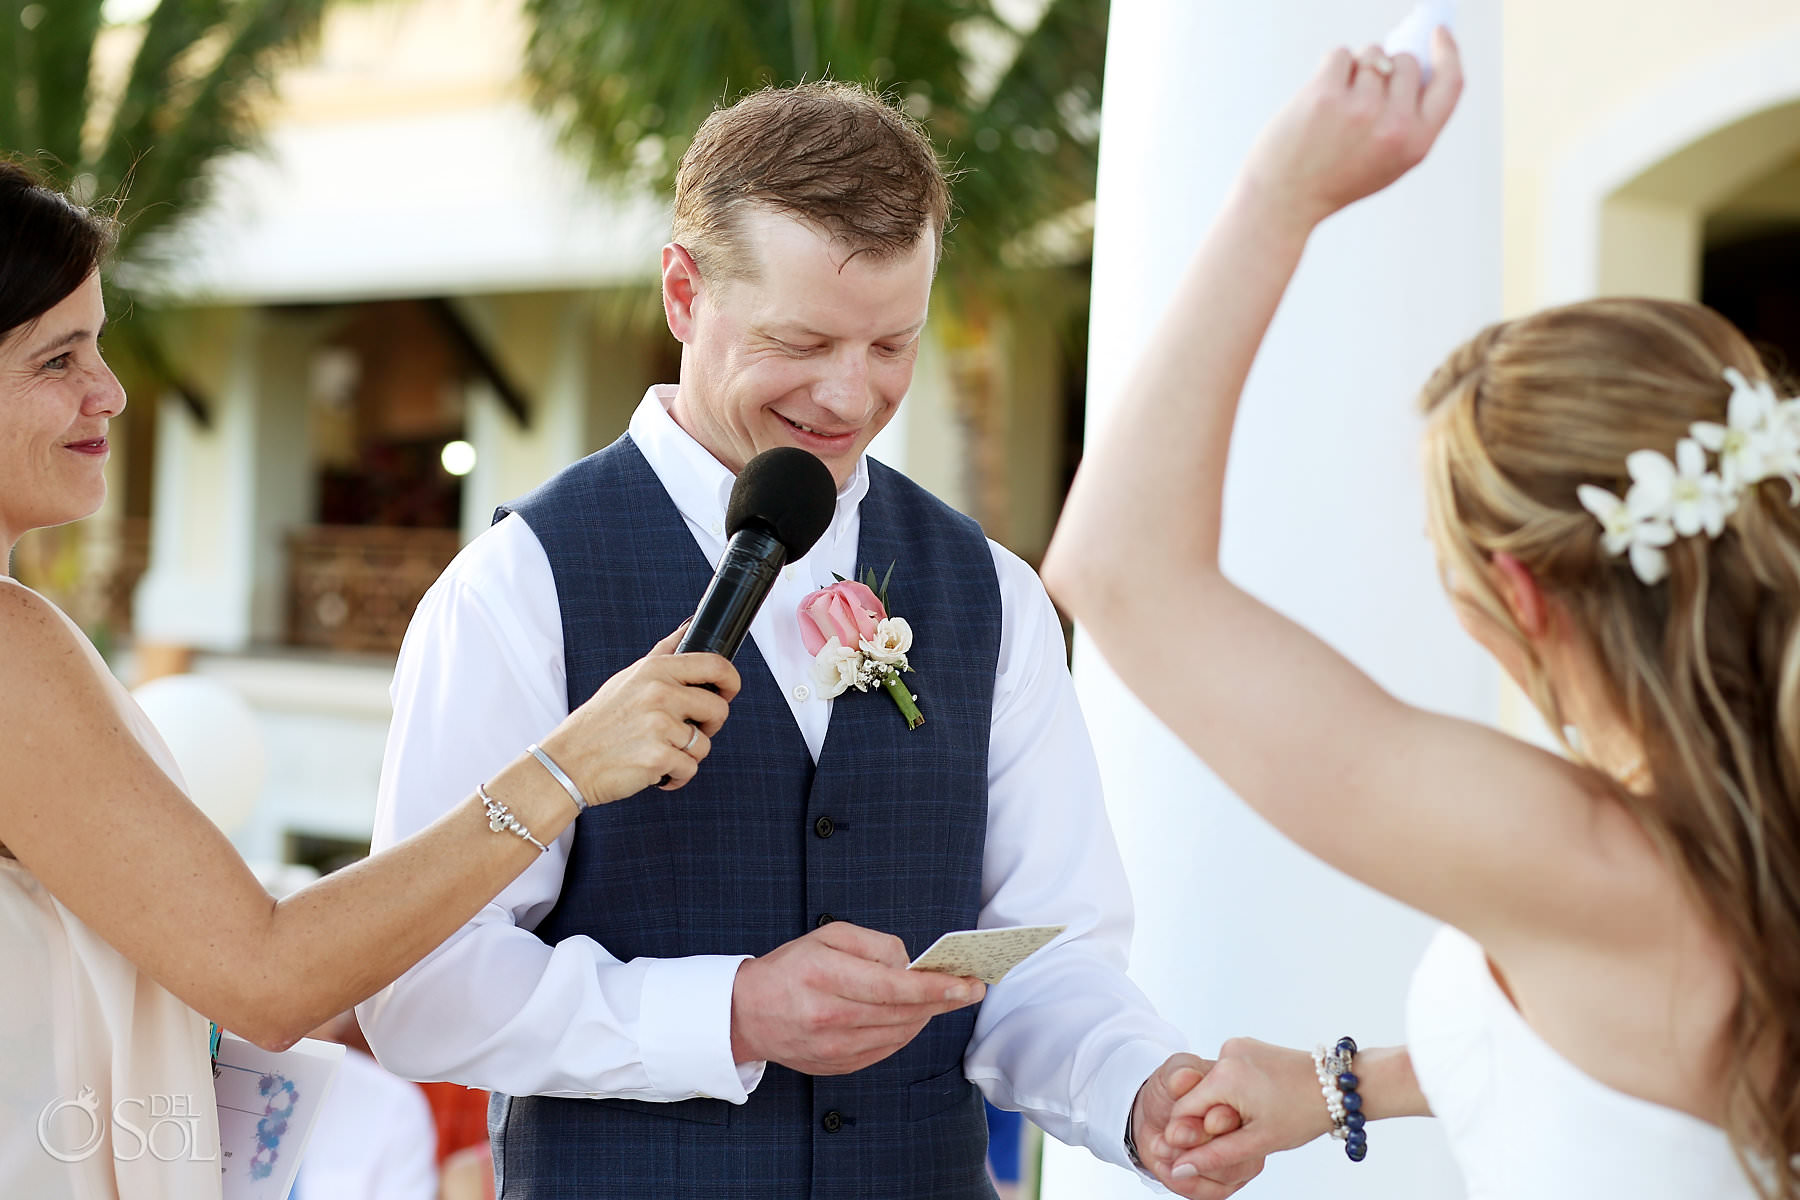 Barcelo Maya Palace Wedding ceremony happy bride and groom